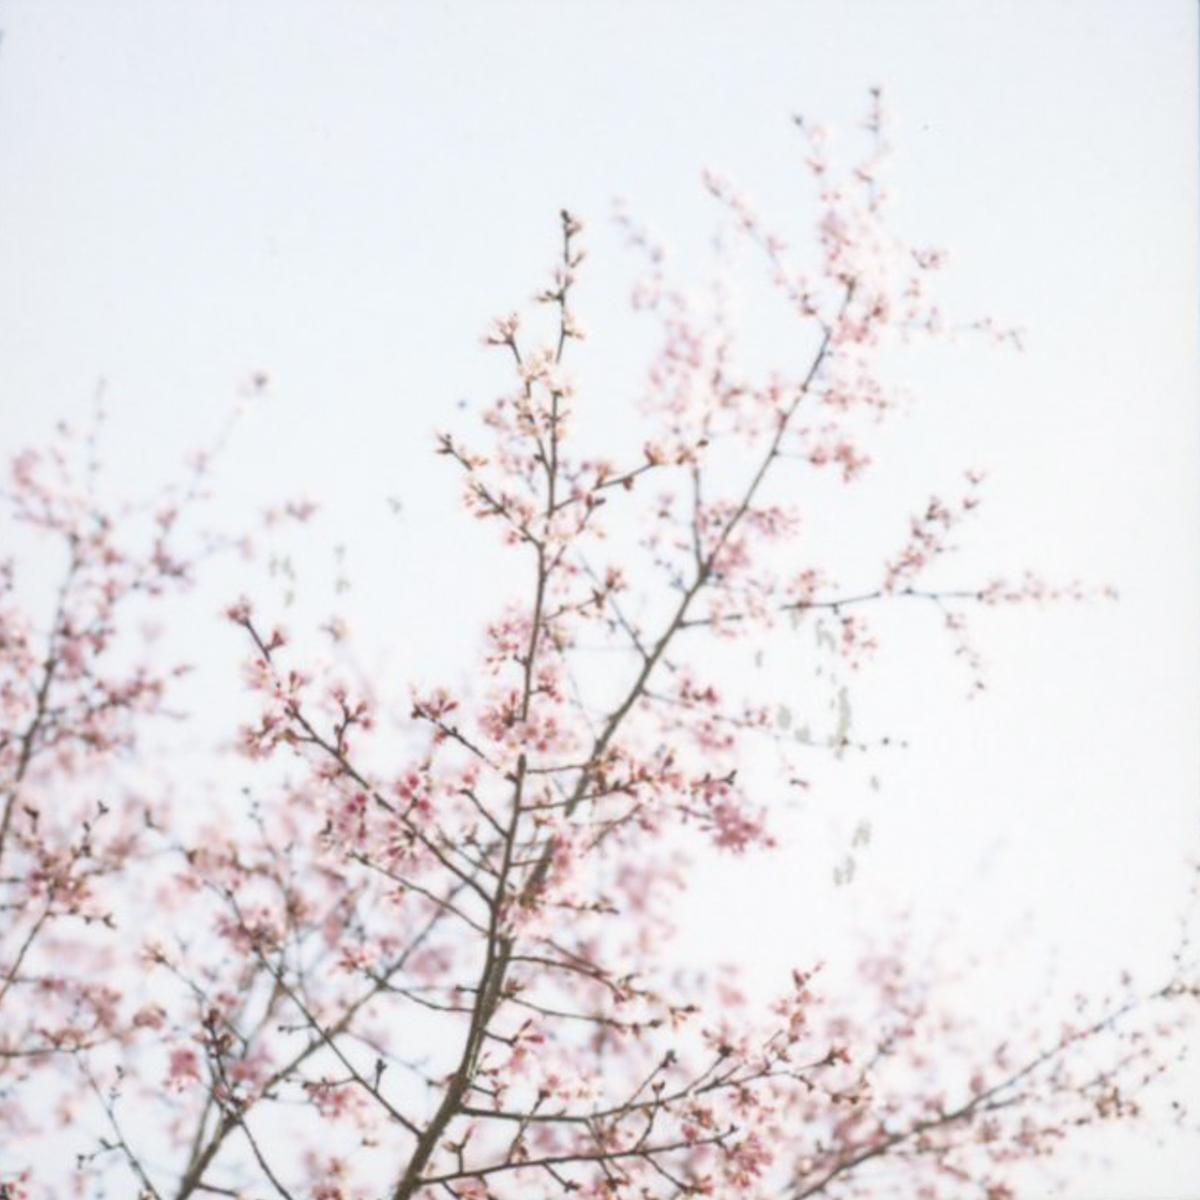 Almost Spring | Hasselblad 500c | Fuji FP 100c | Azzari Jarrett